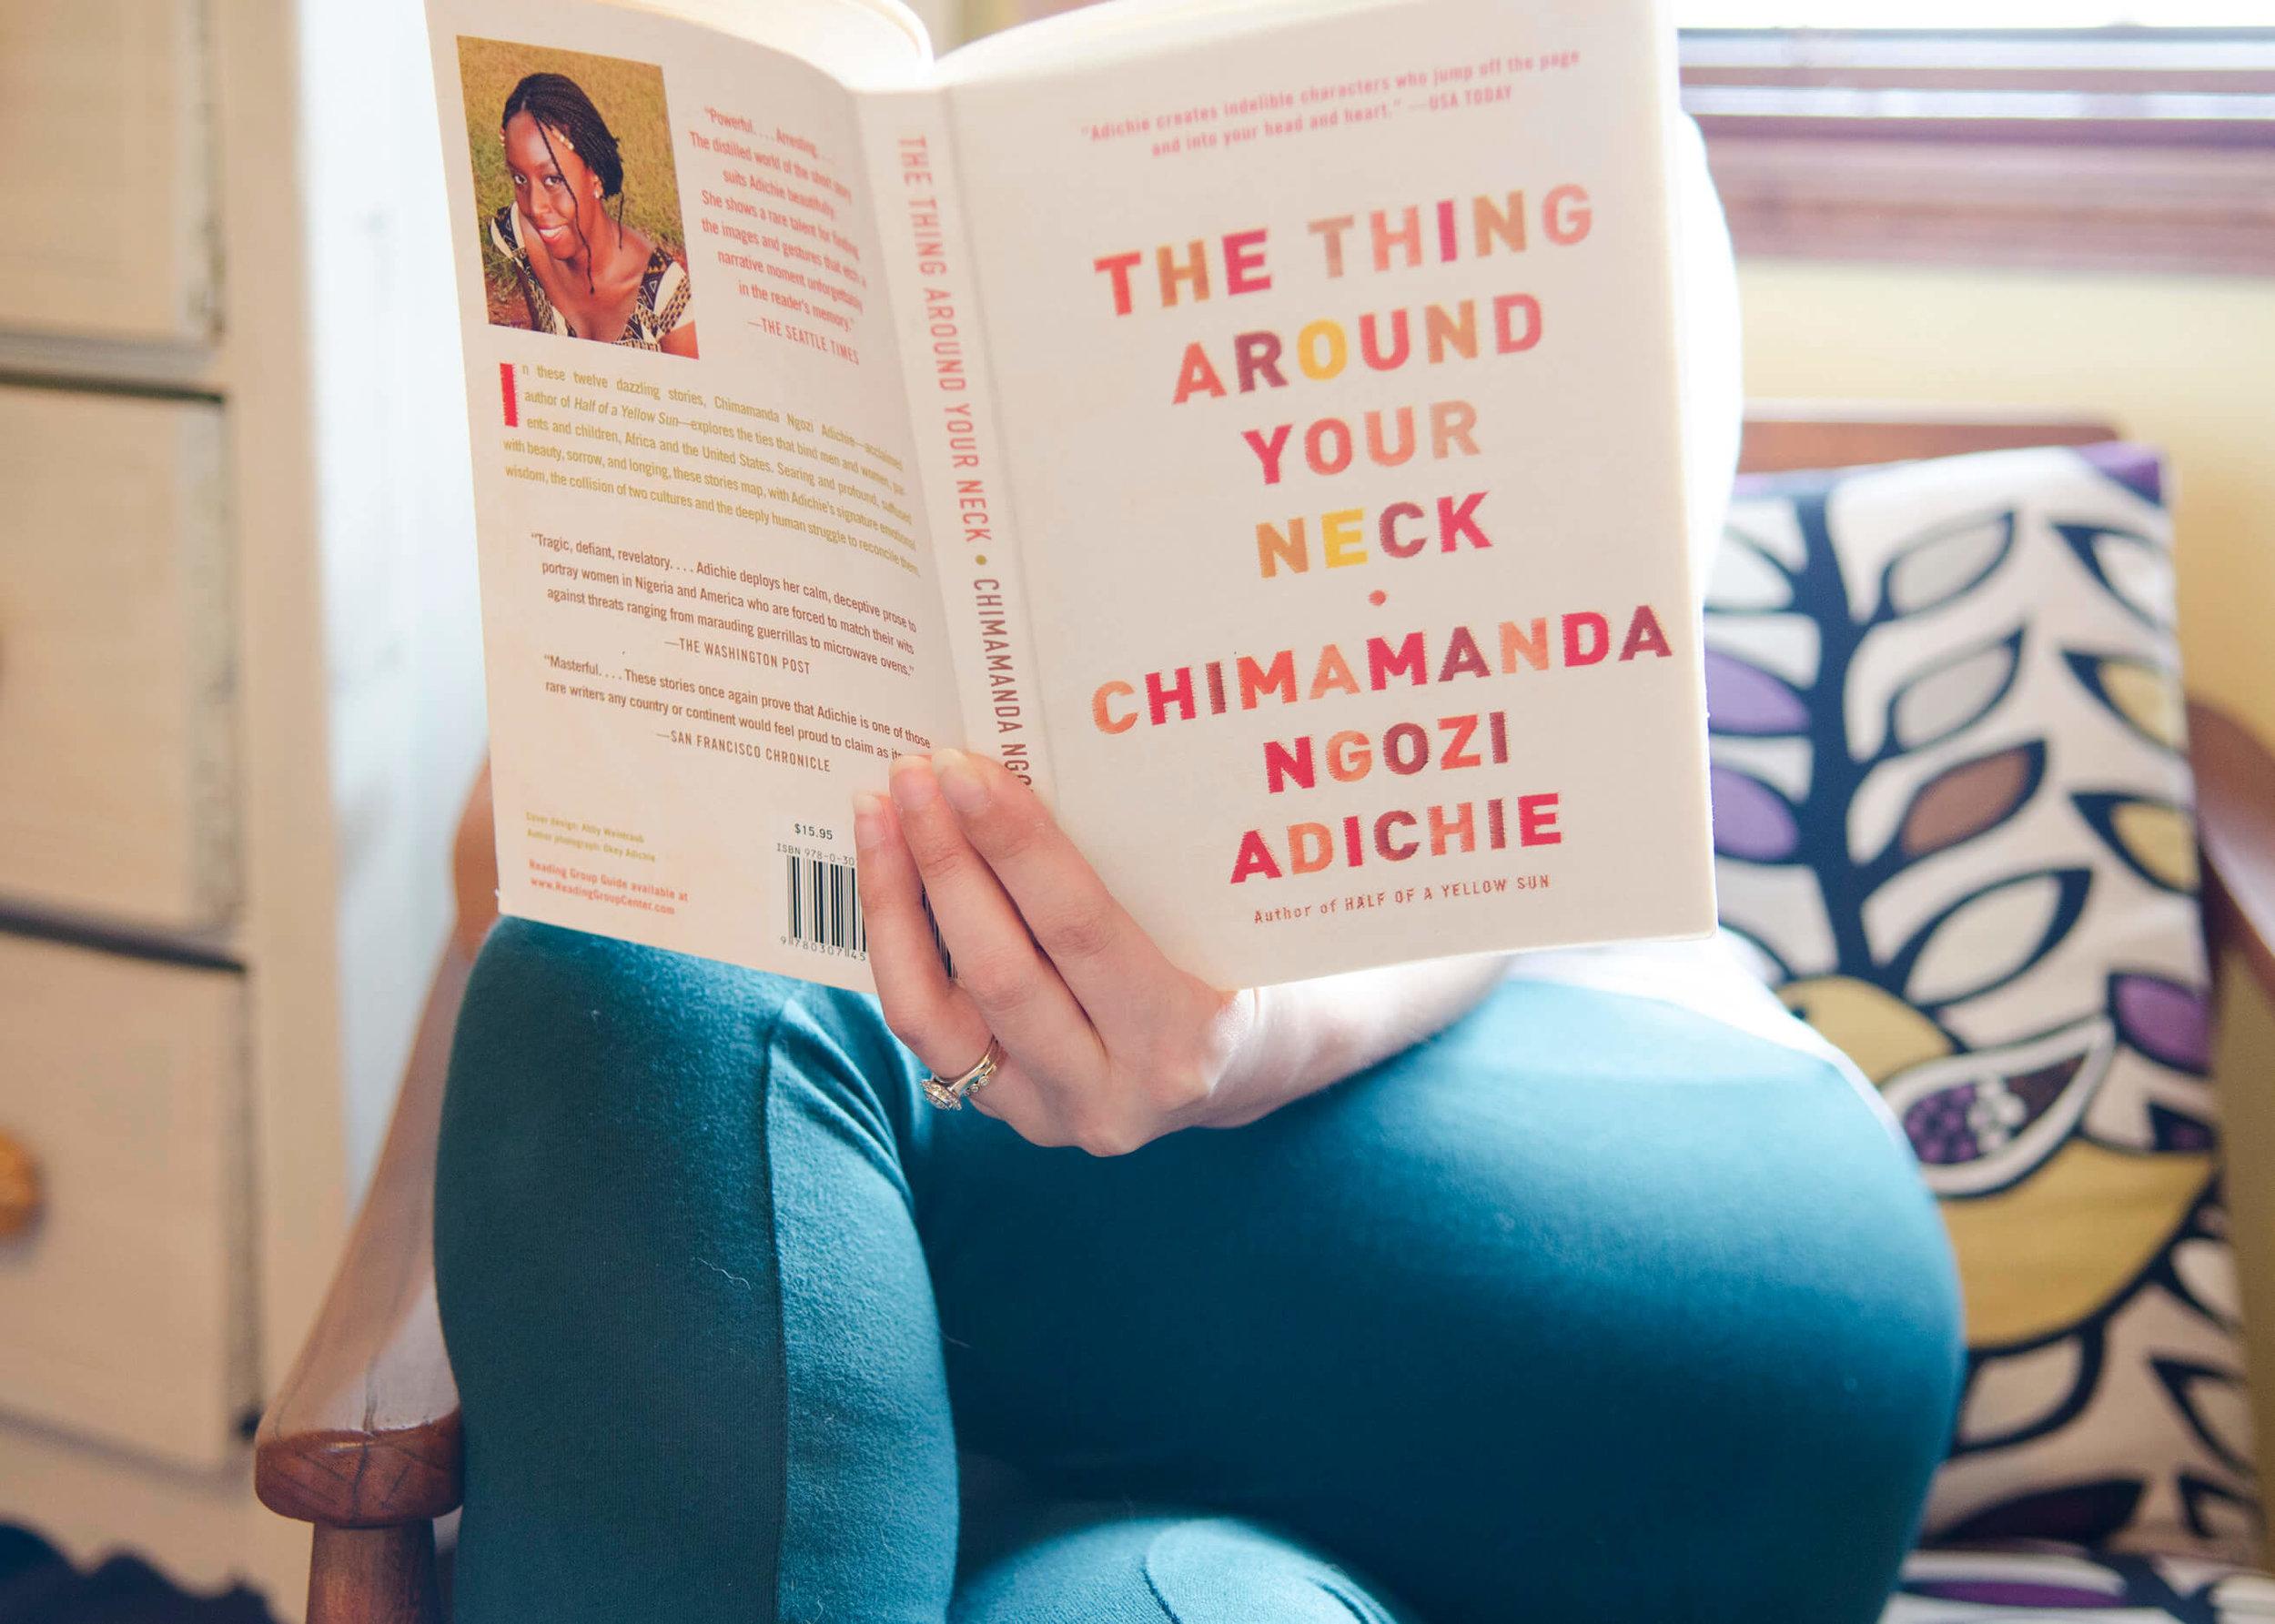 Chimamanda Ngozie Adichie by Sam Spahr for Oui We